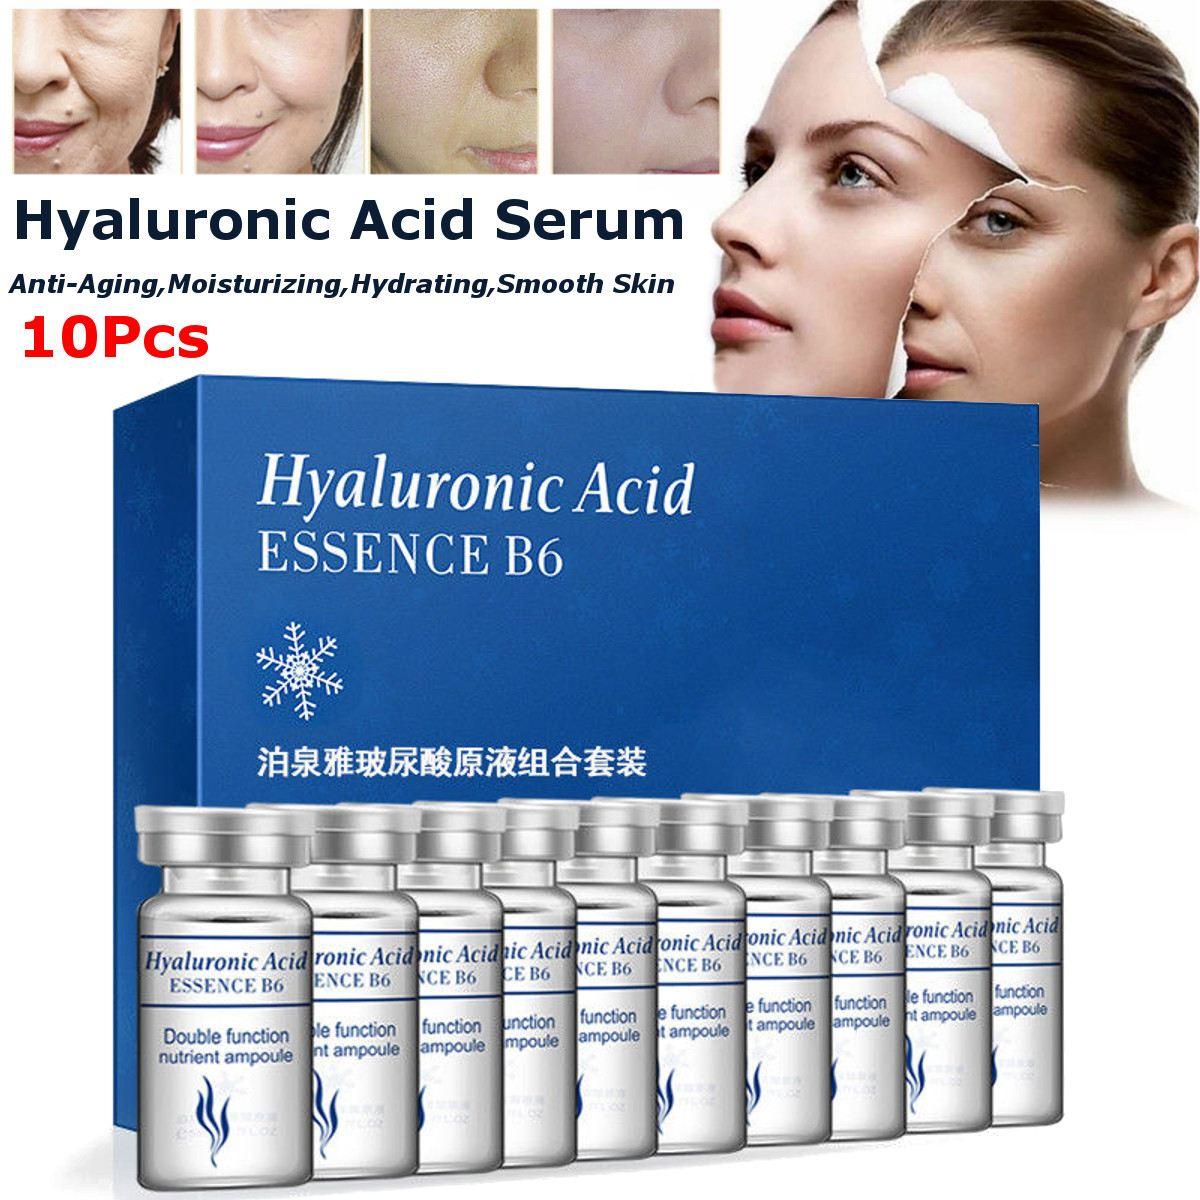 BIOAQUA 10Pcs Vitamin Hyaluronic Acid Serum Moisturizer Facial Skin Care Set Anti Wrinkle Anti Aging Collagen Essences Liquid